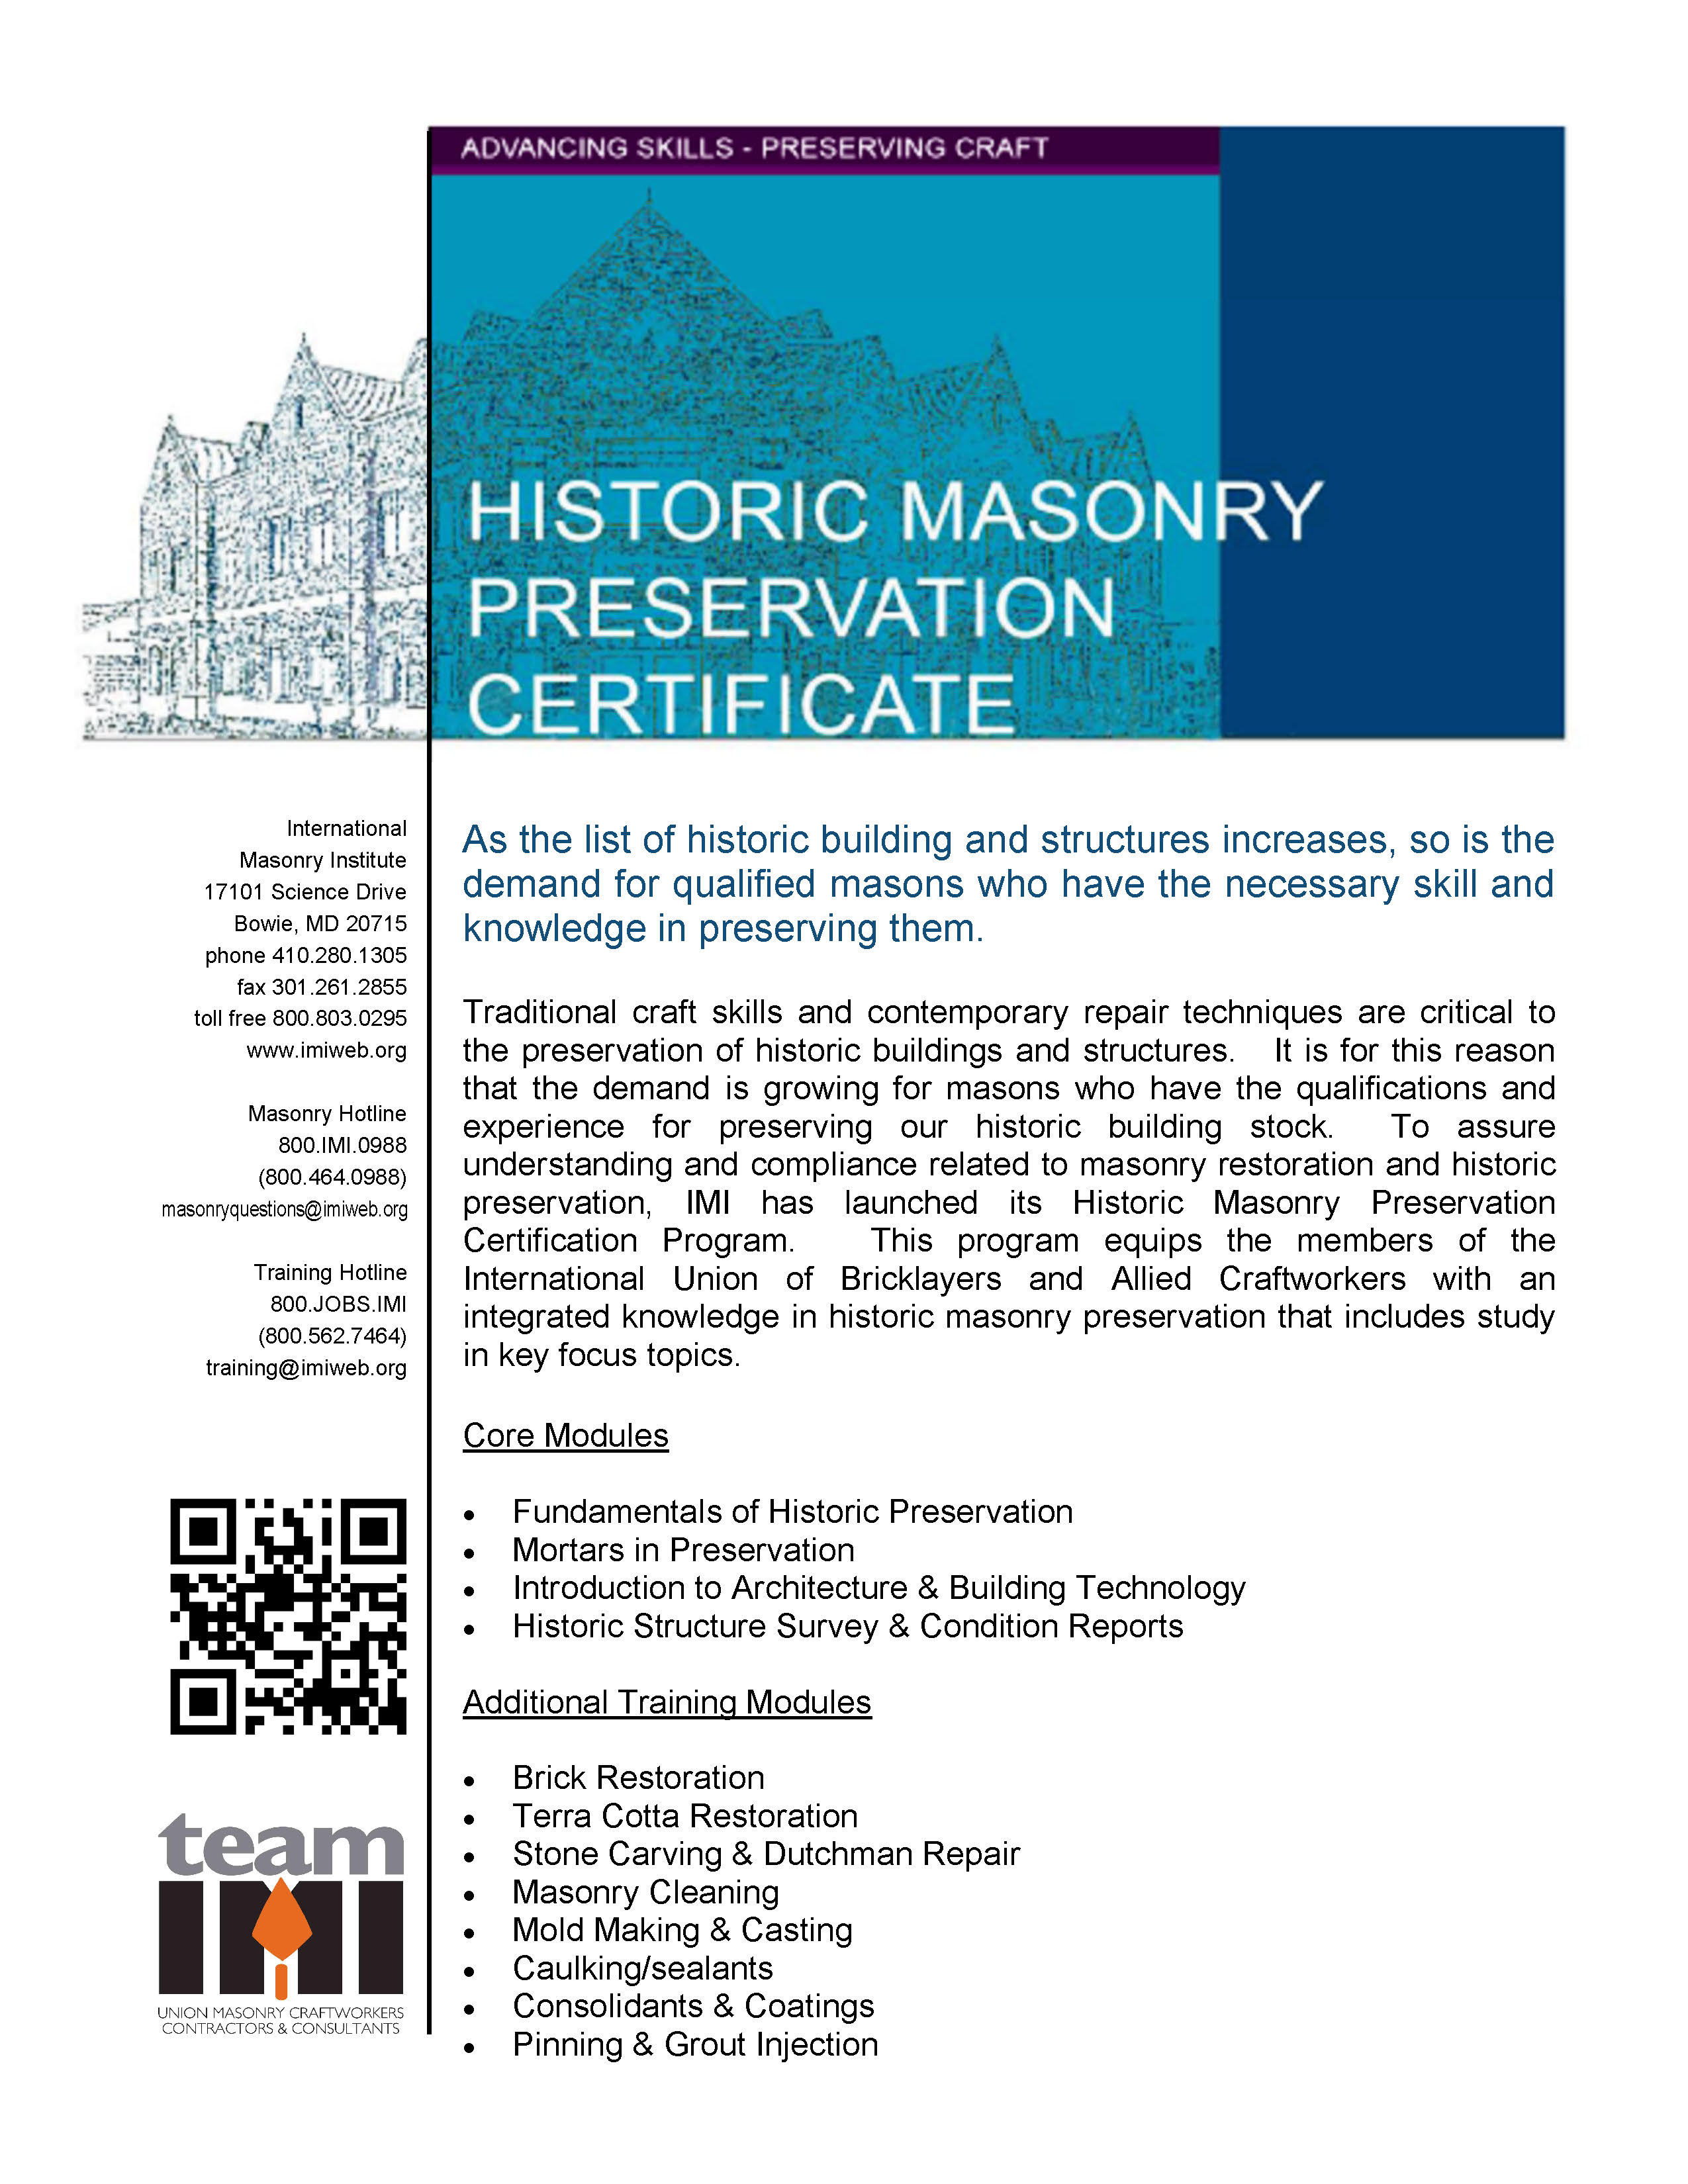 Imi Hmp Certificate Program Flyerpage1 International Masonry